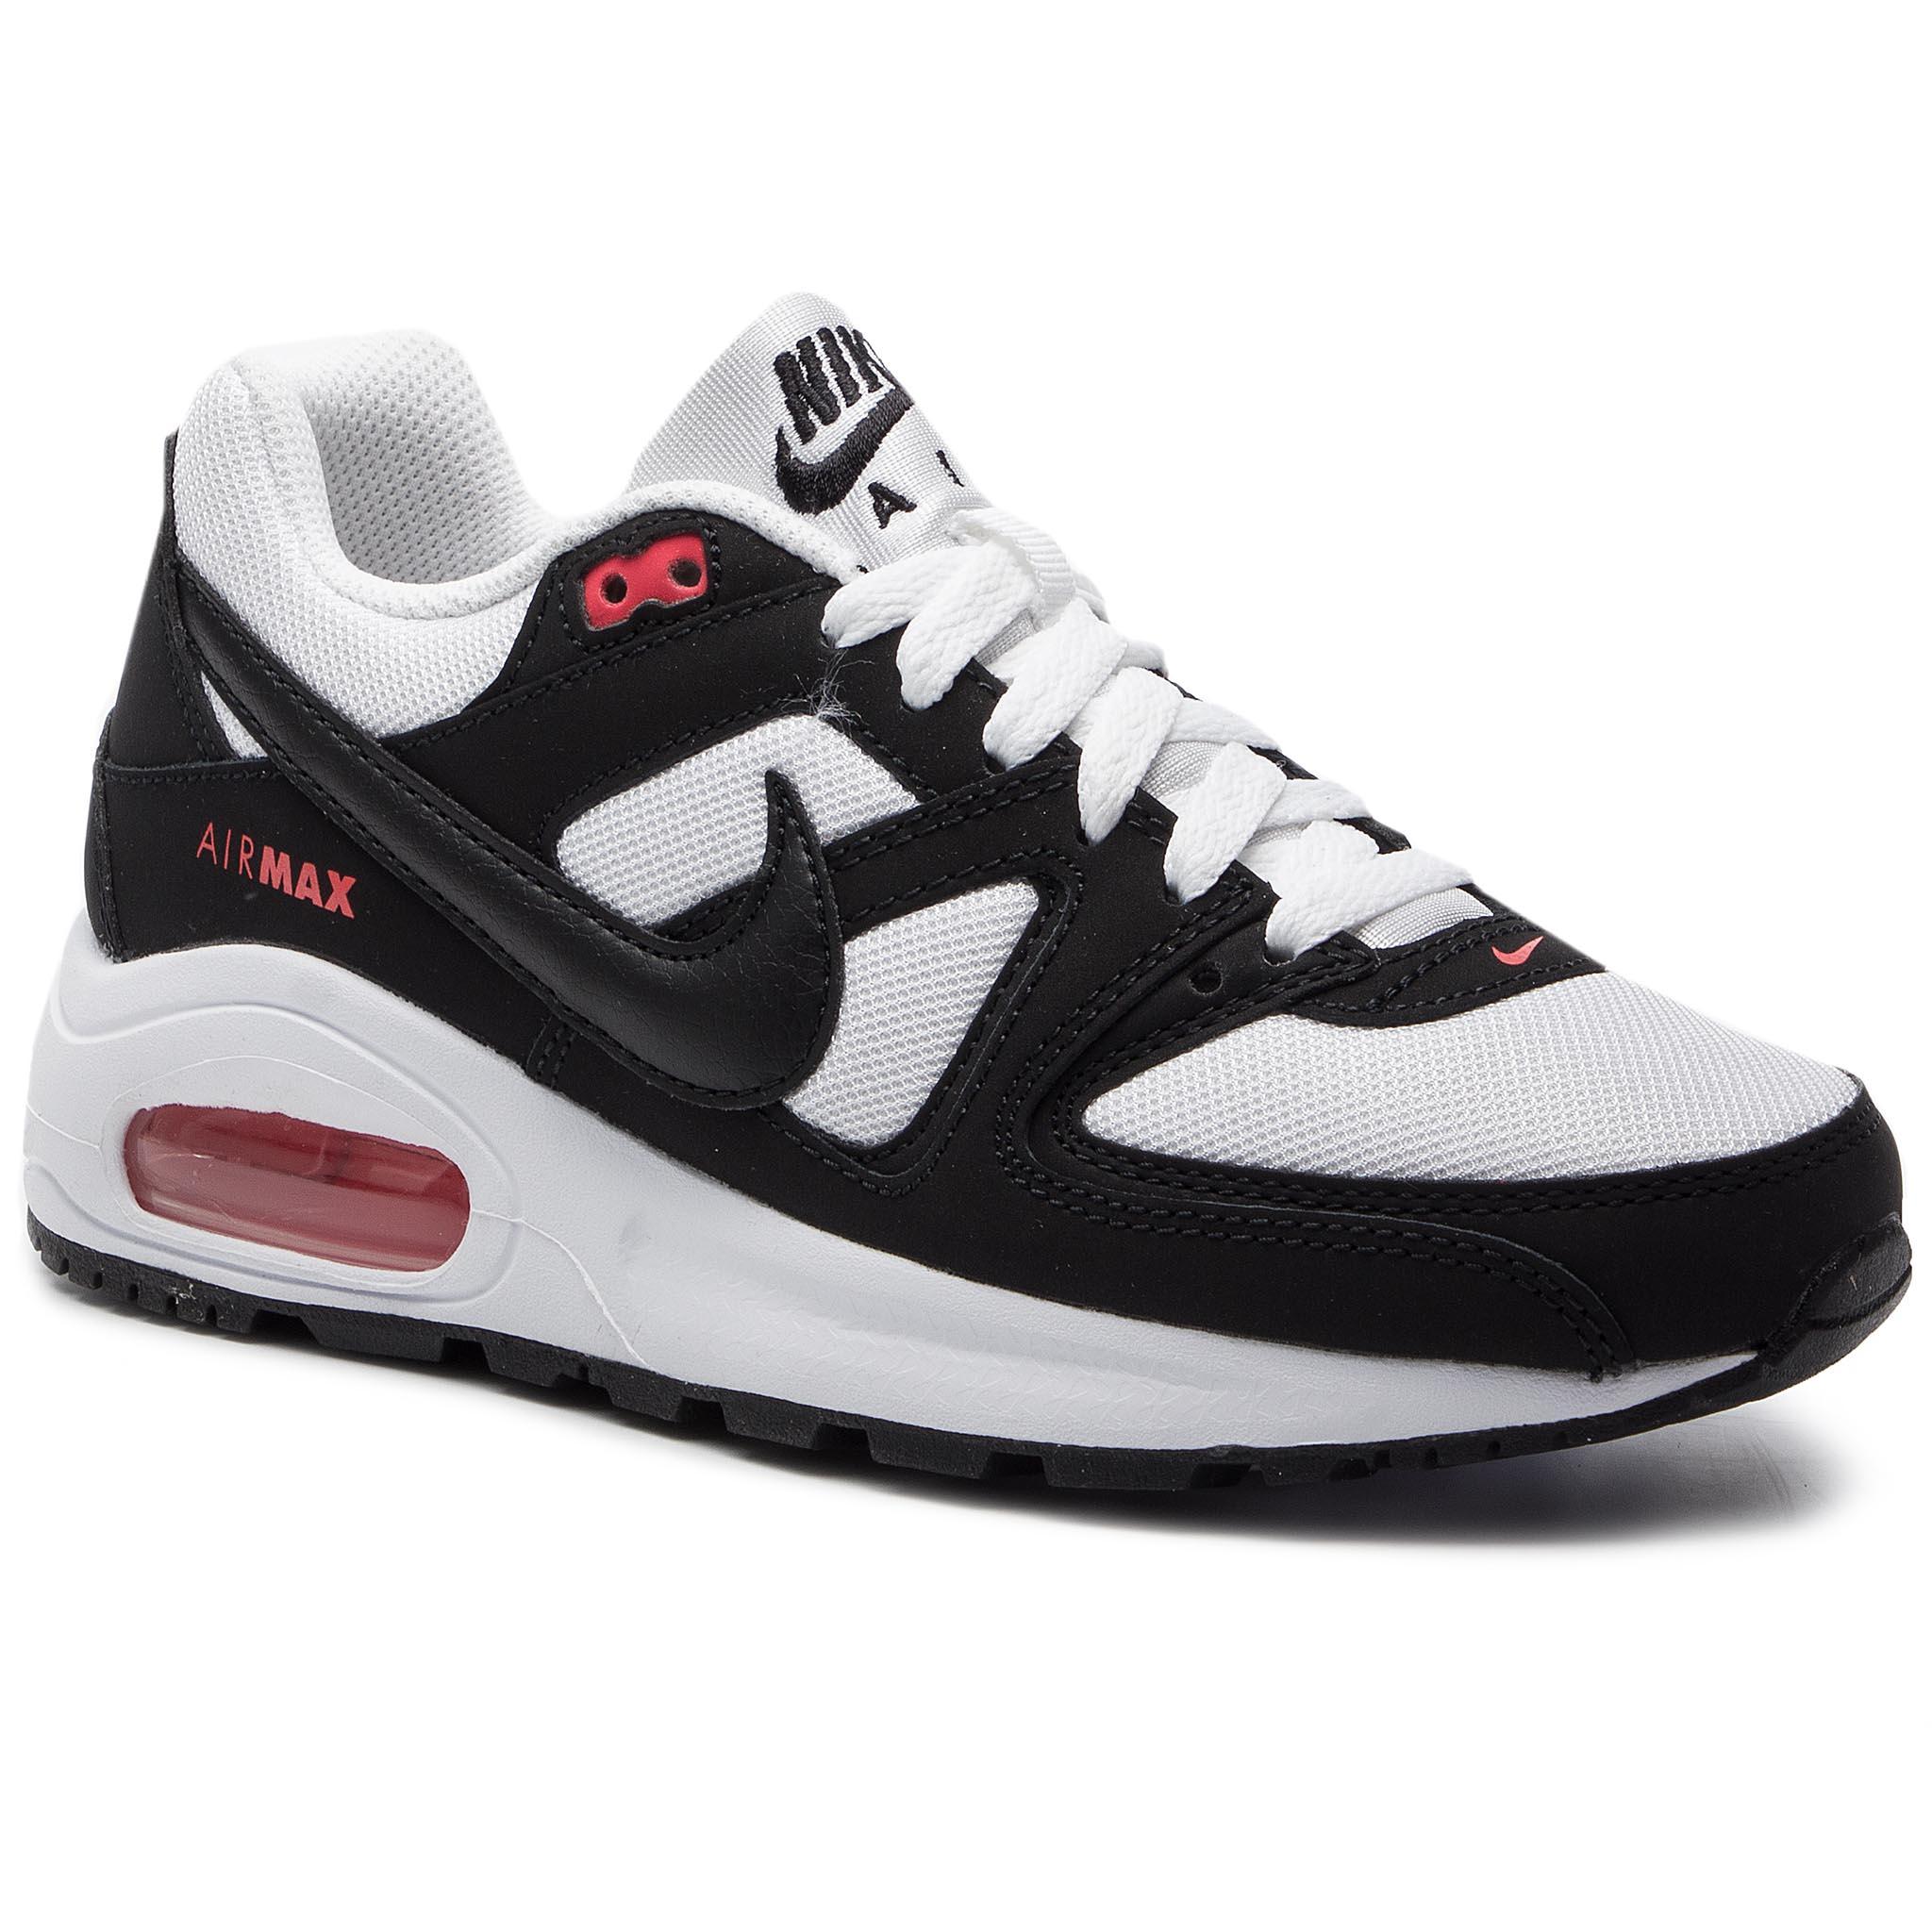 online retailer 2f37f f28ff Shoes NIKE Air Max Command Flex (GS) 844346 100 White Black Max Orange